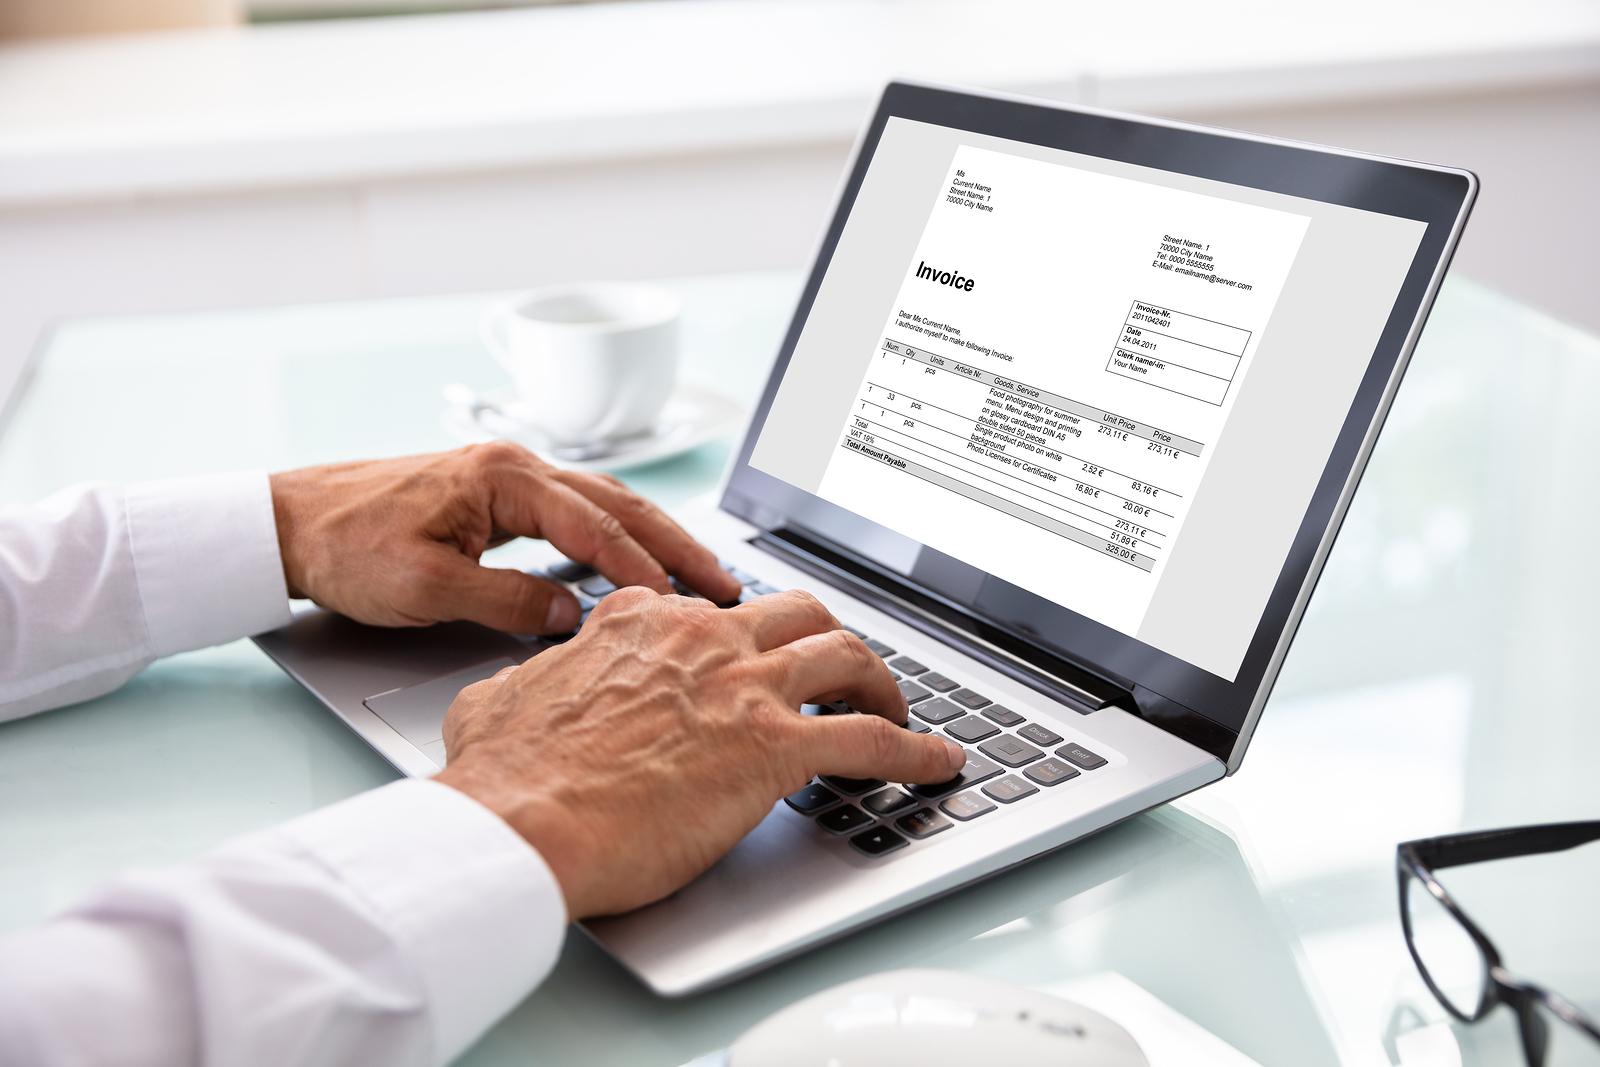 bigstock-Businessman-Checking-Invoice-O-257000698